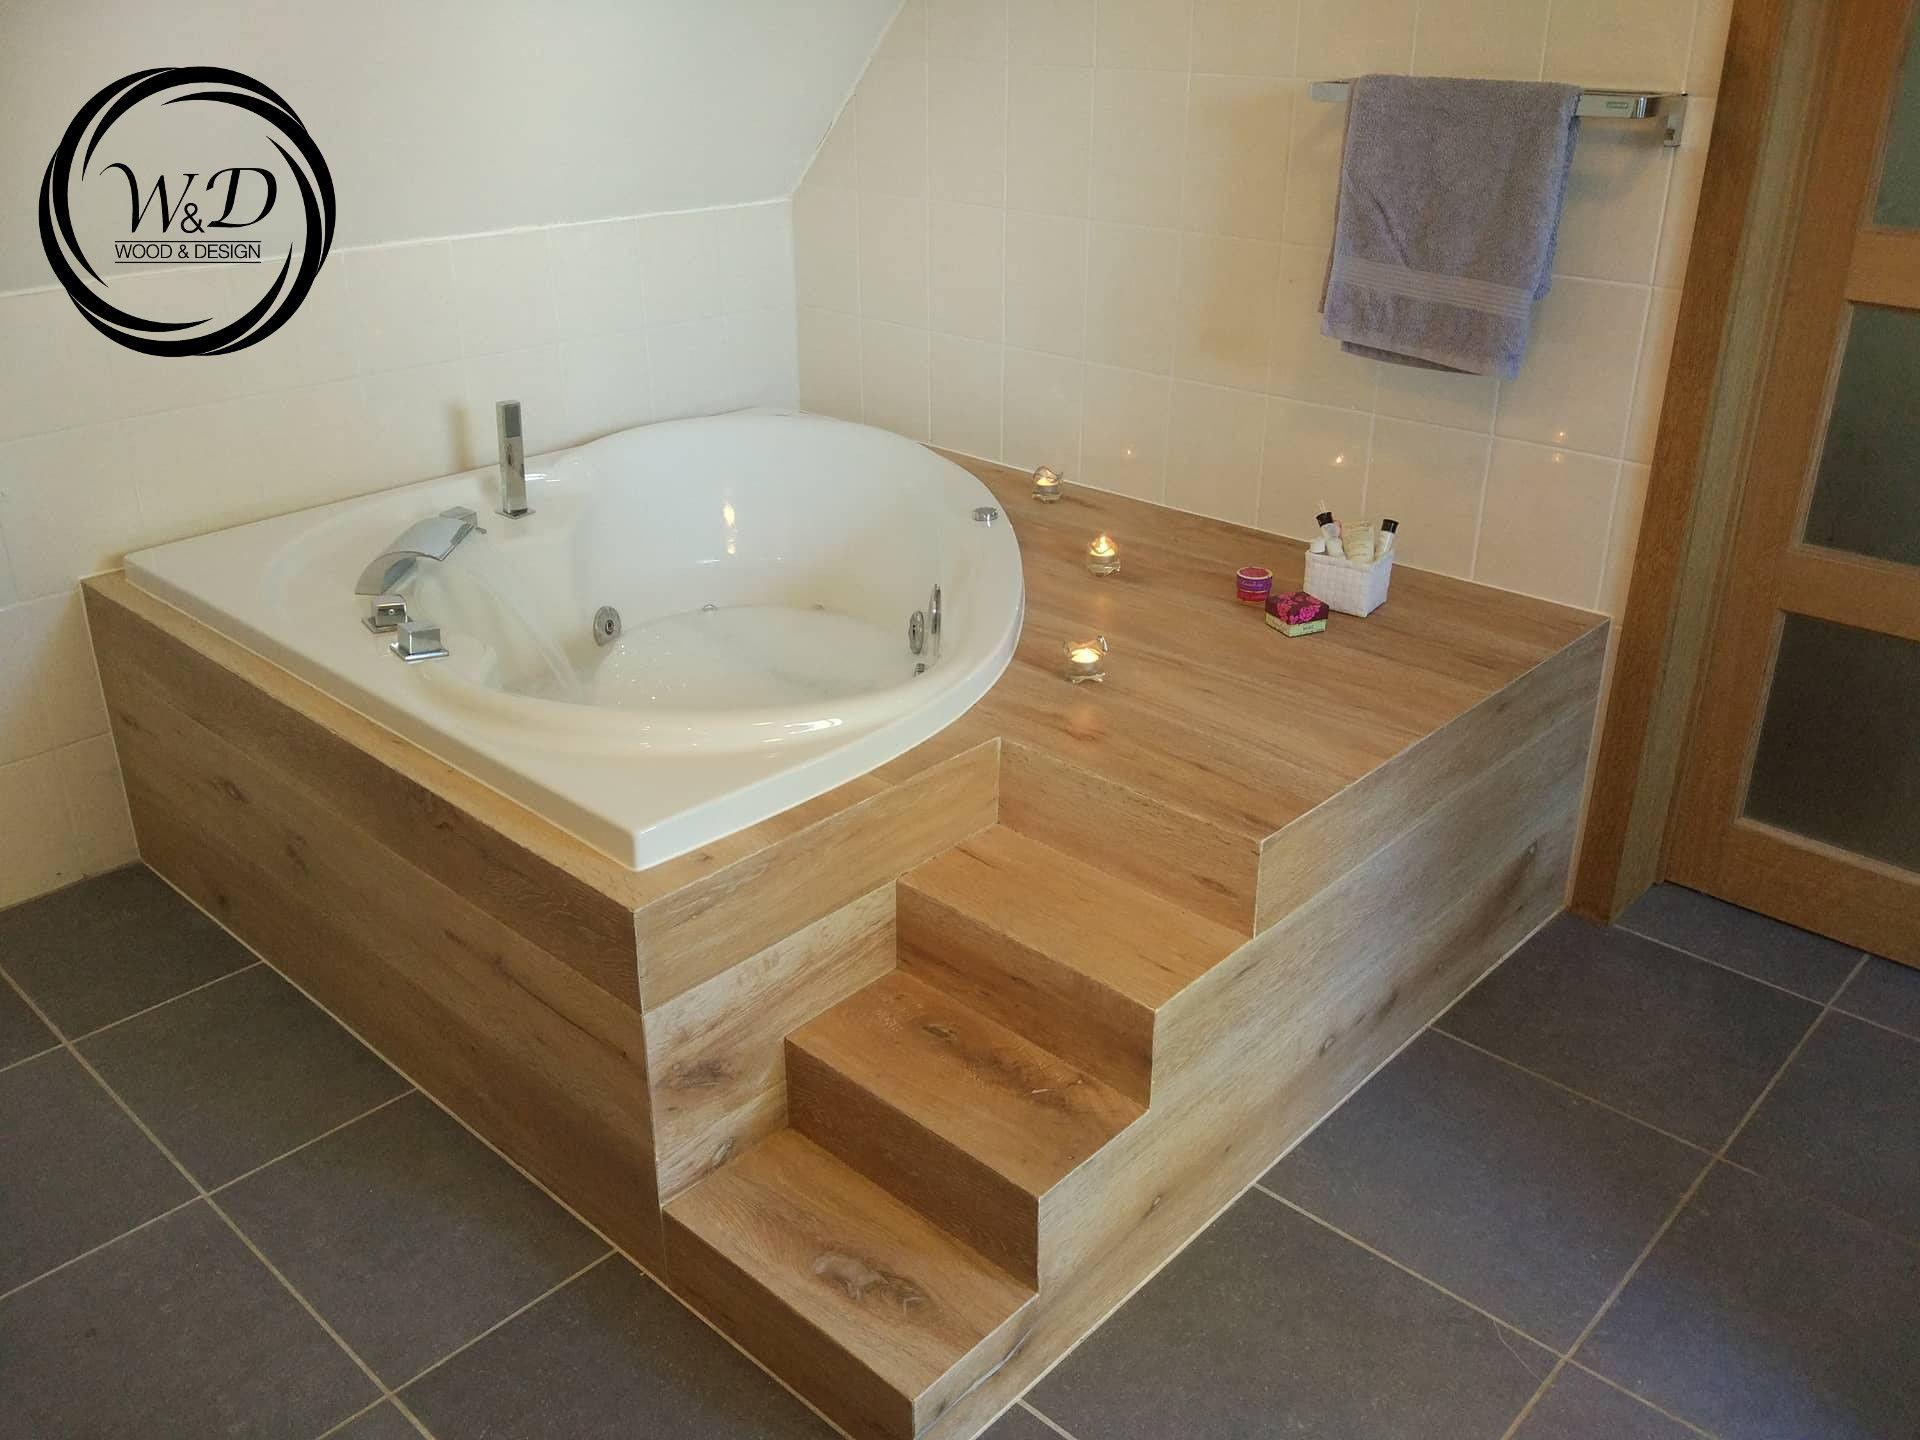 habillage baignoire d angle aplusshippingcenter. Black Bedroom Furniture Sets. Home Design Ideas